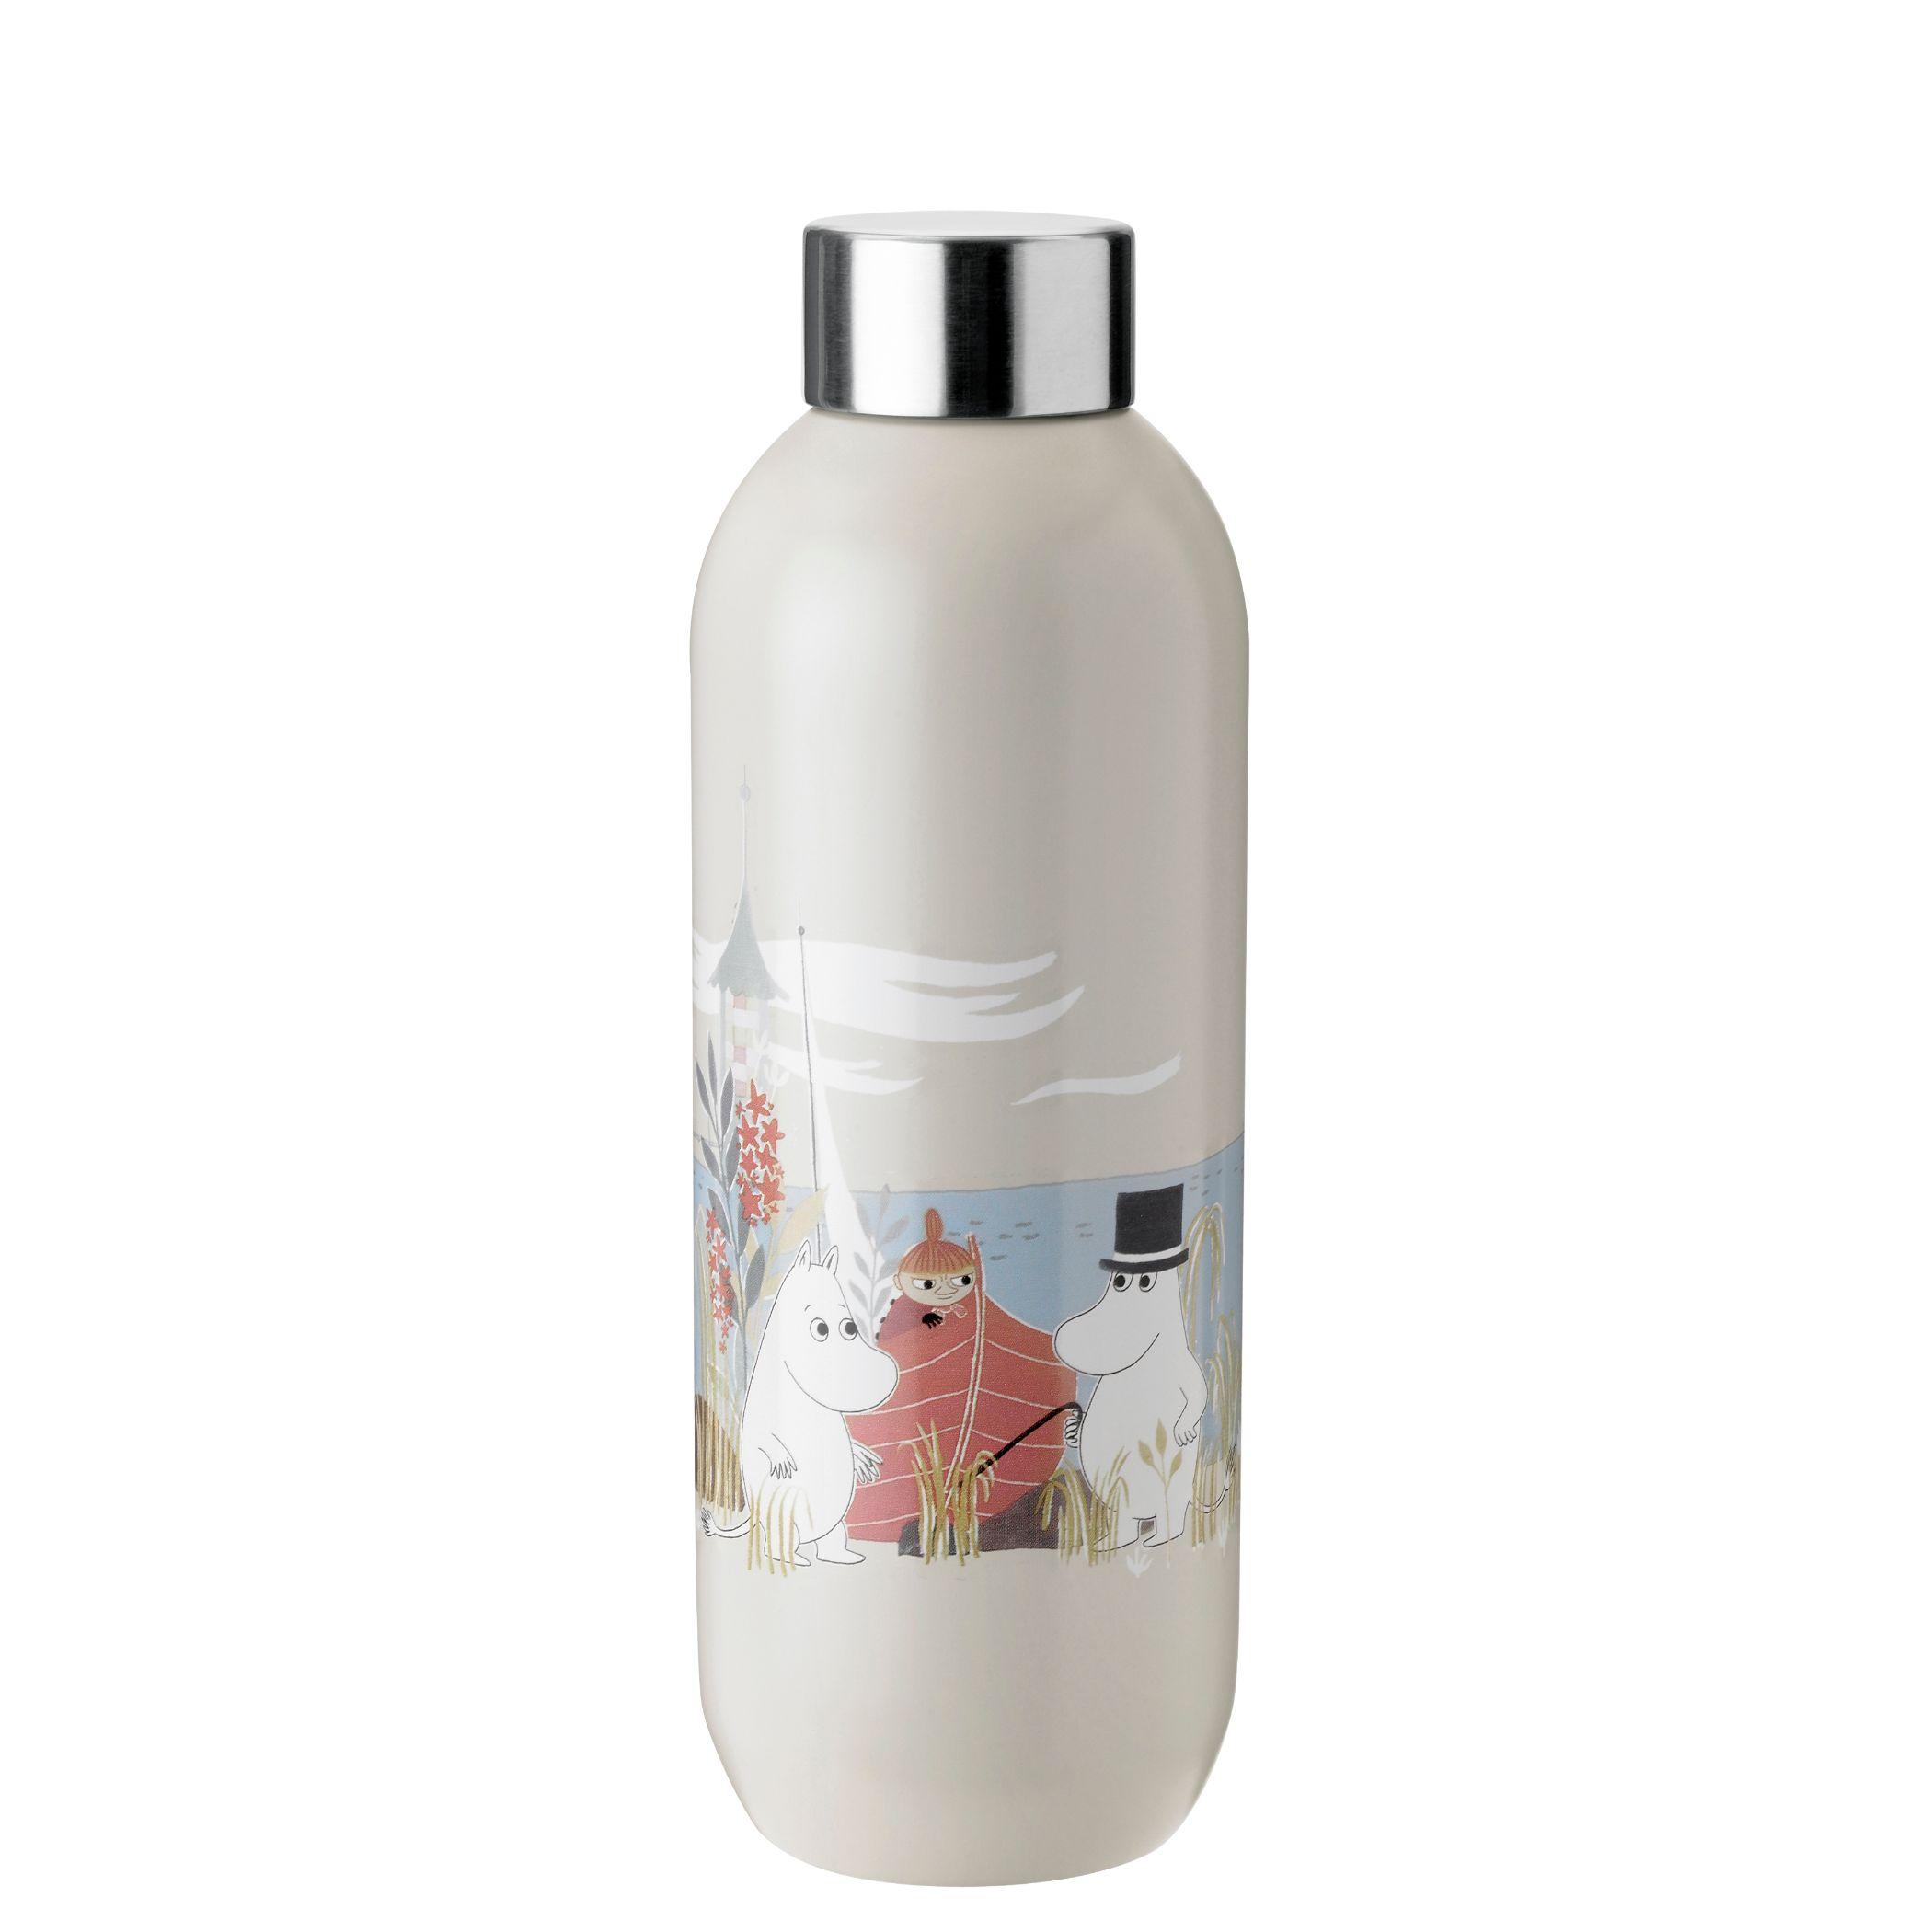 Stelton Keep Cool Mumi drikkeflaske, 750 ml, sand